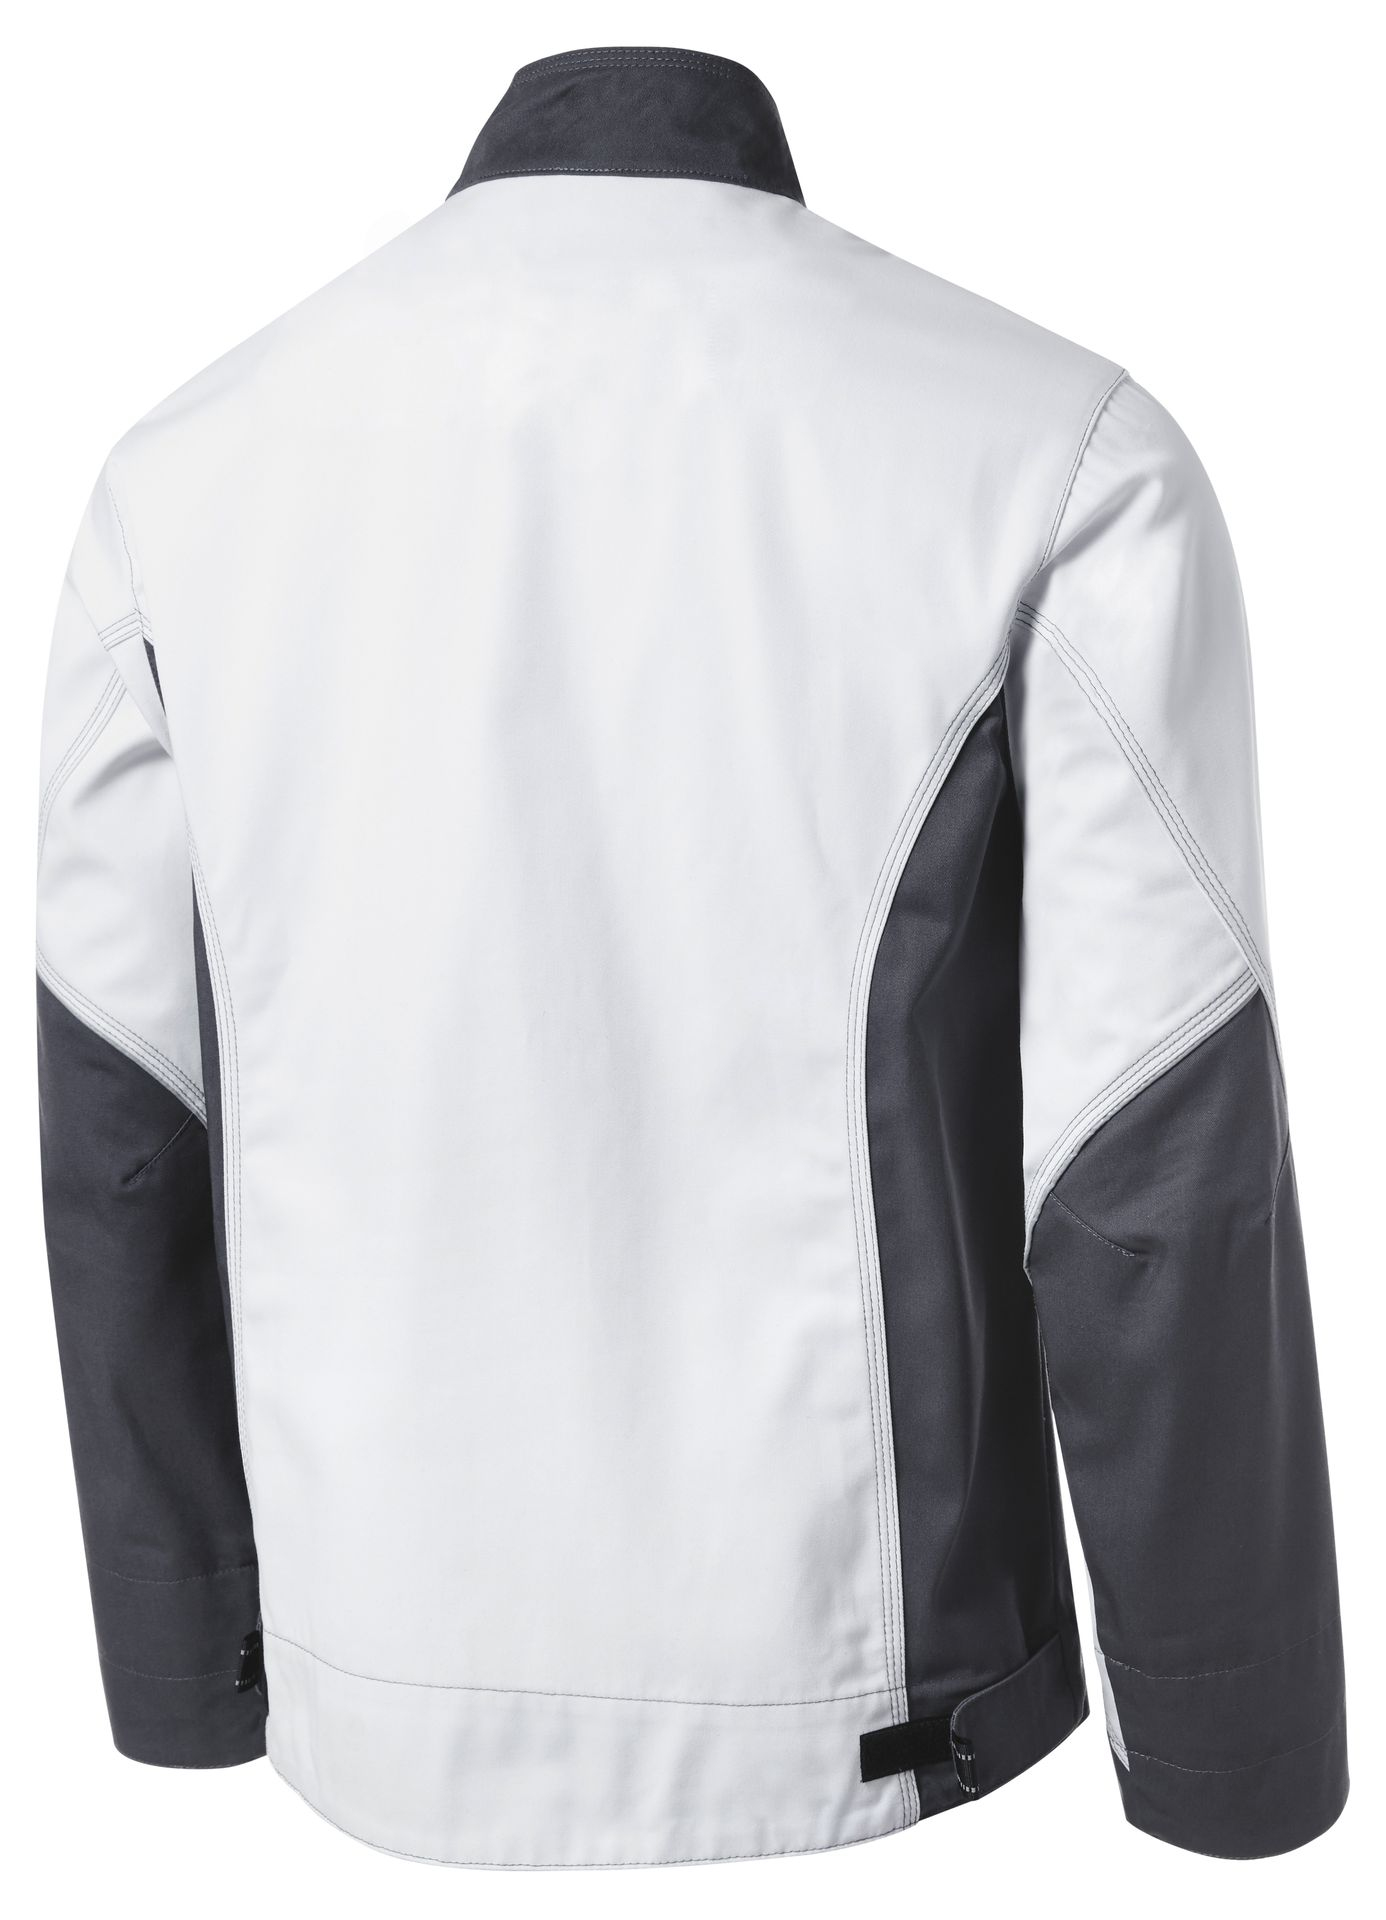 Arbeitsjacke Berufskleidung Berufskleidung Arbeitskleidung 2-farbig Neu